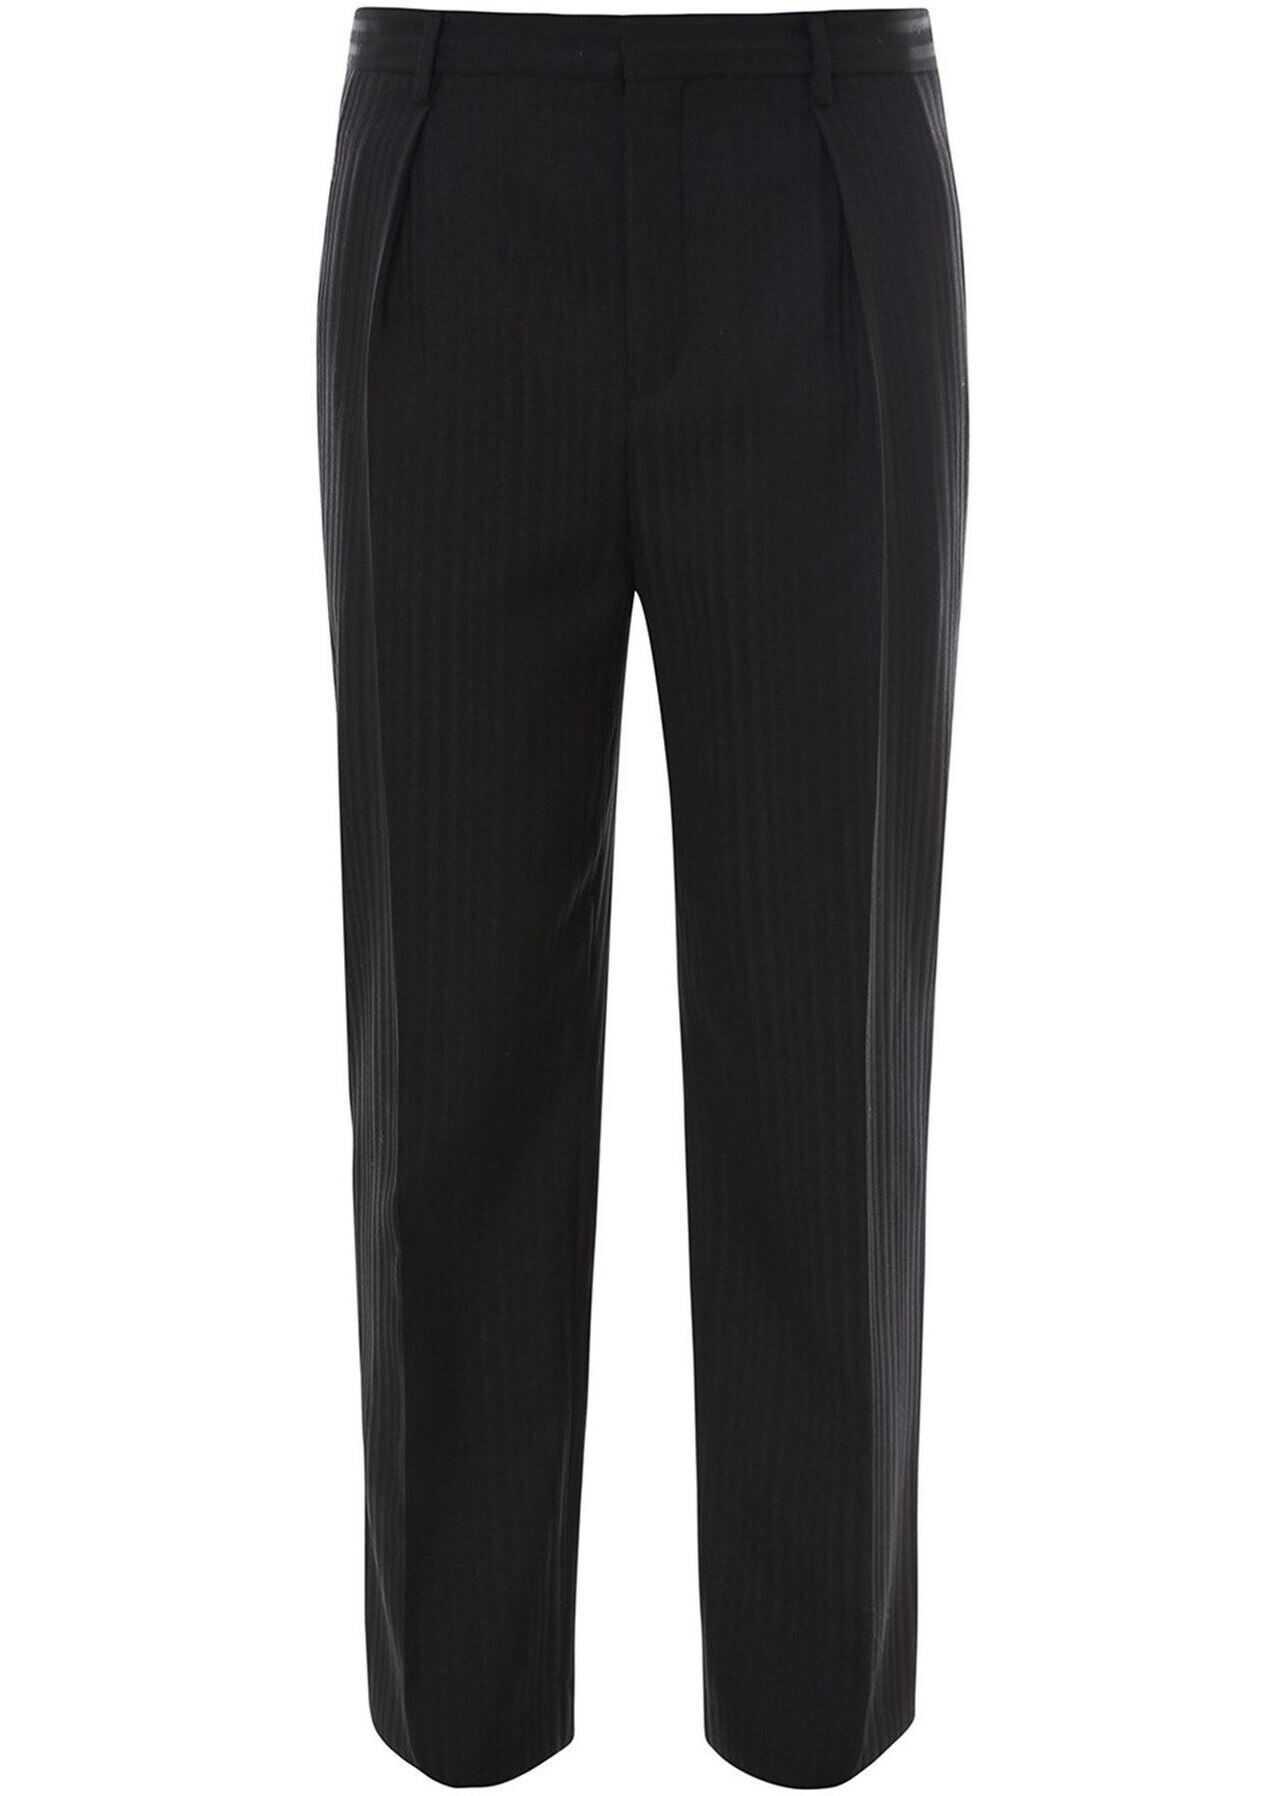 Saint Laurent Raised-Stripe Trousers Black imagine